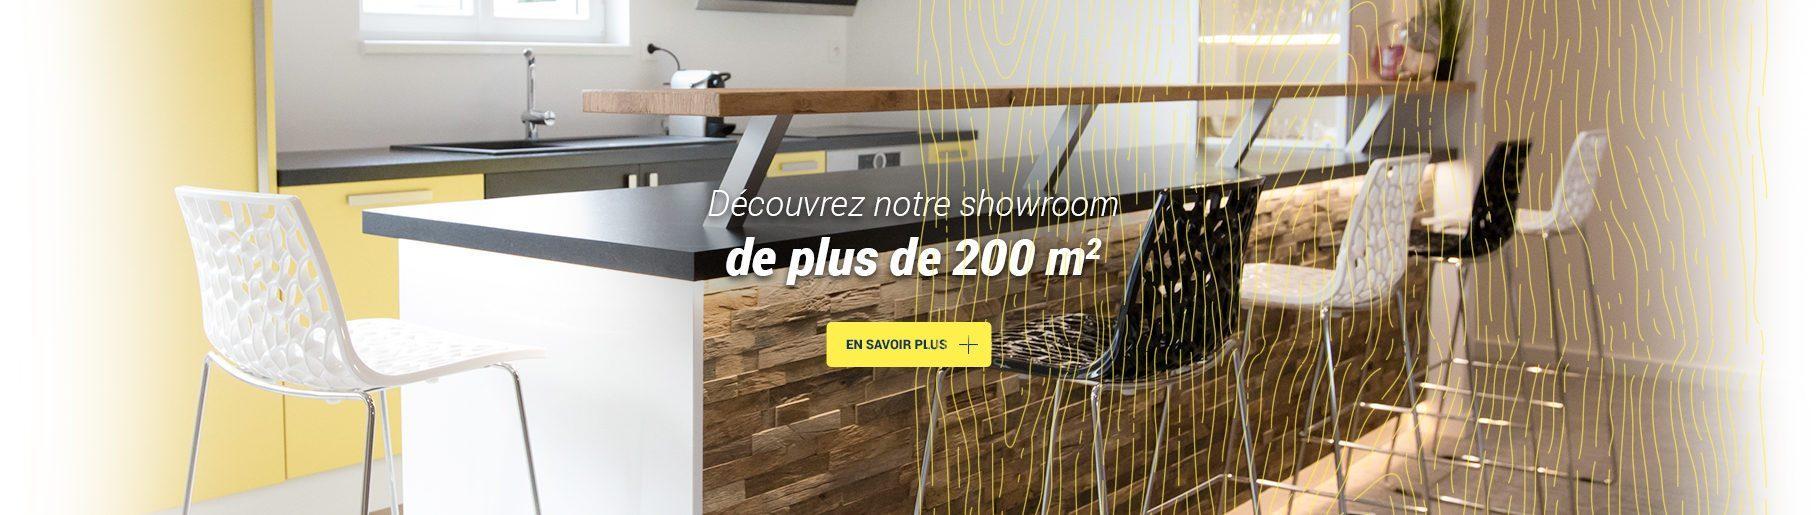 "<img width=""1820"" height=""515"" src=""http://www.menuiserie-kleim.fr/app/uploads/2017/06/showroom-1820x515.jpg"" class=""attachment-full size-full wp-post-image"" alt=""Showroom"" title=""Showroom"" data-copyright="""" data-headline=""showroom-1820x515"" data-description="""" />"